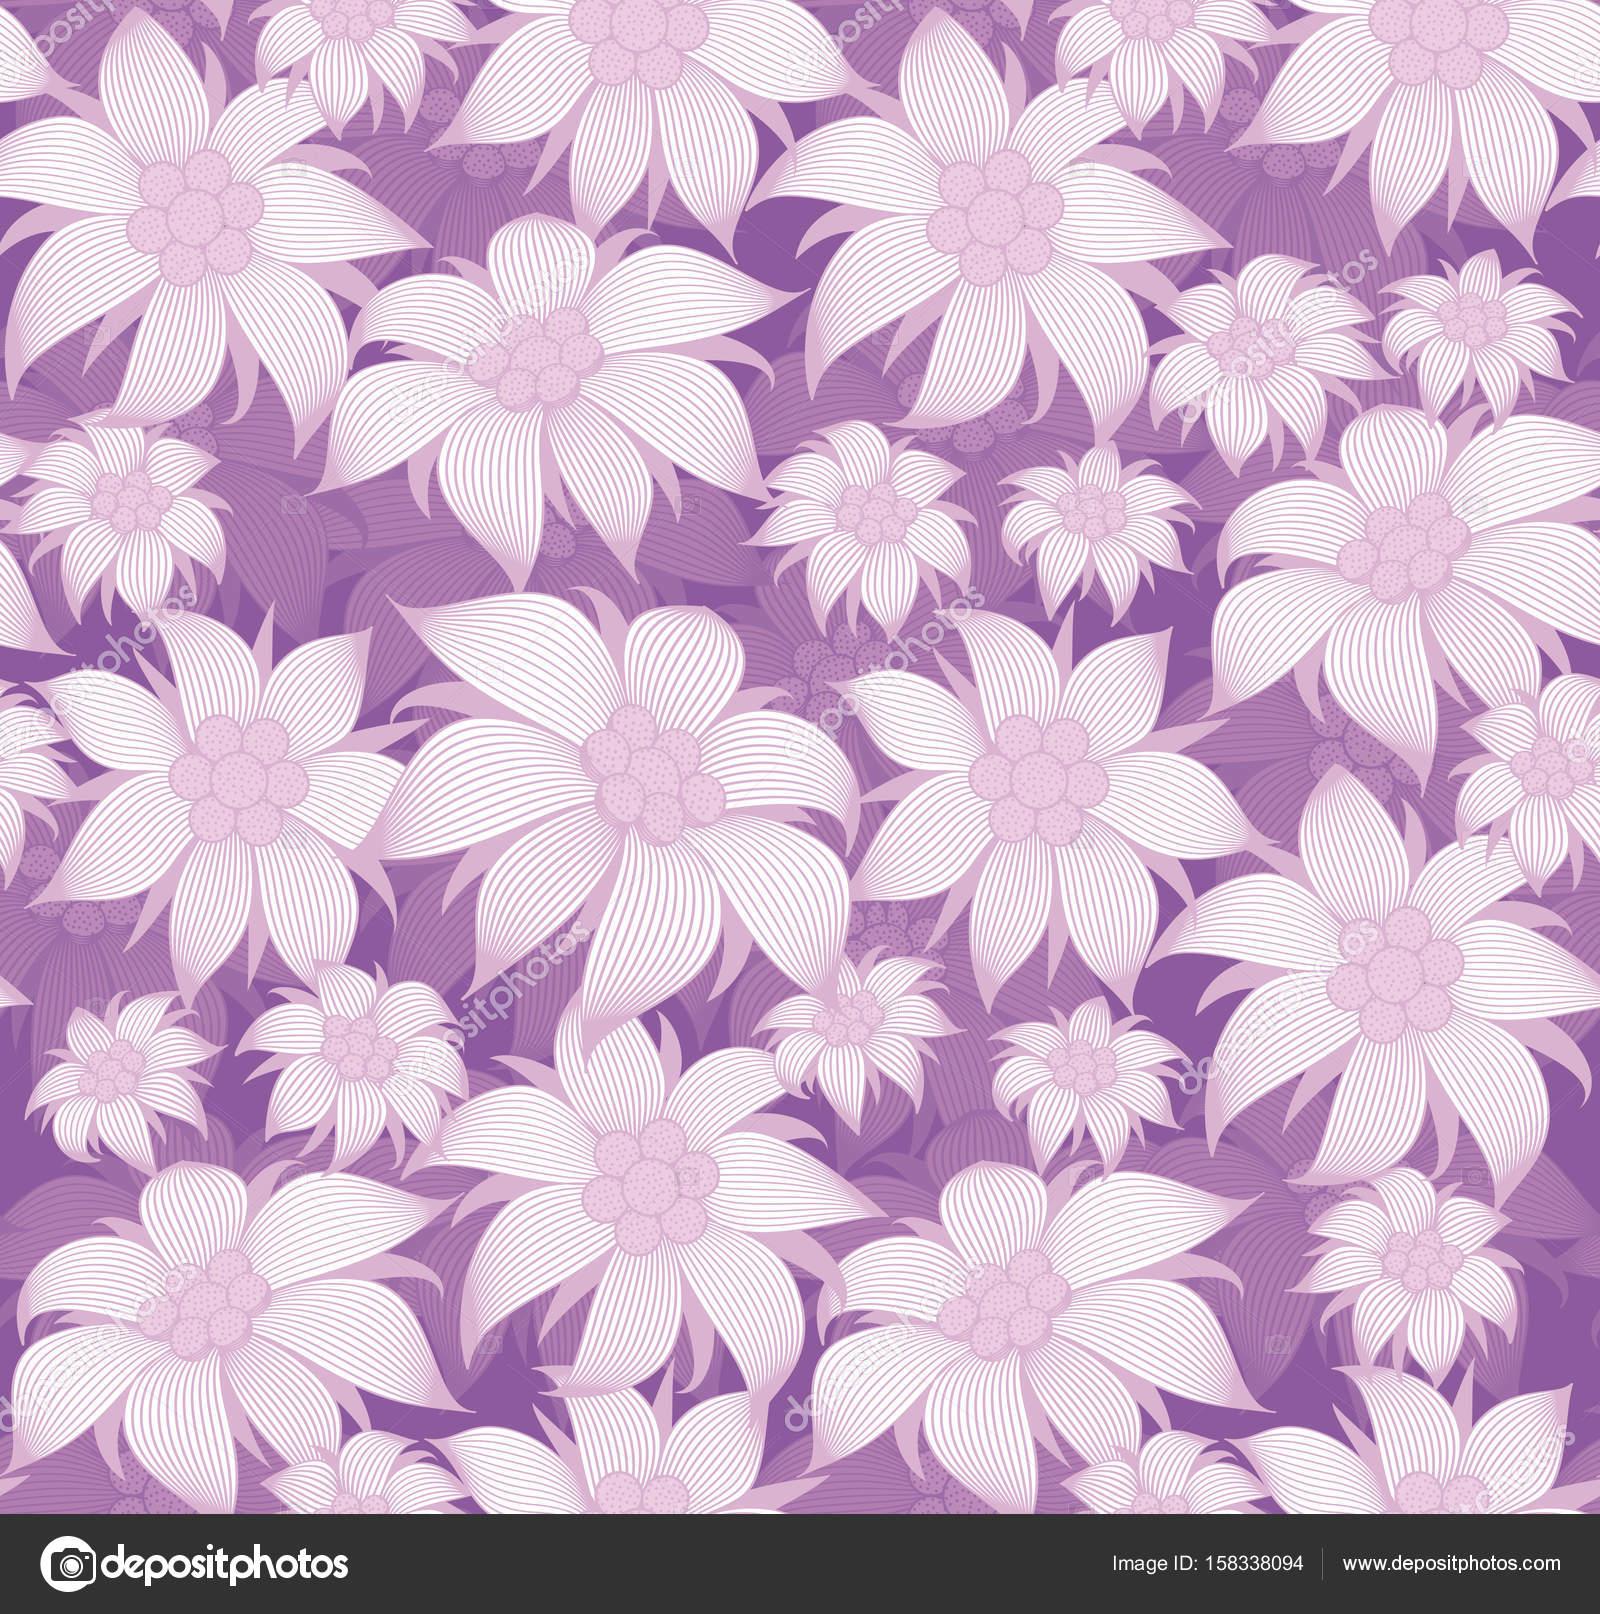 Seamless Floral Pattern On Purple Background Purple Flowers Of